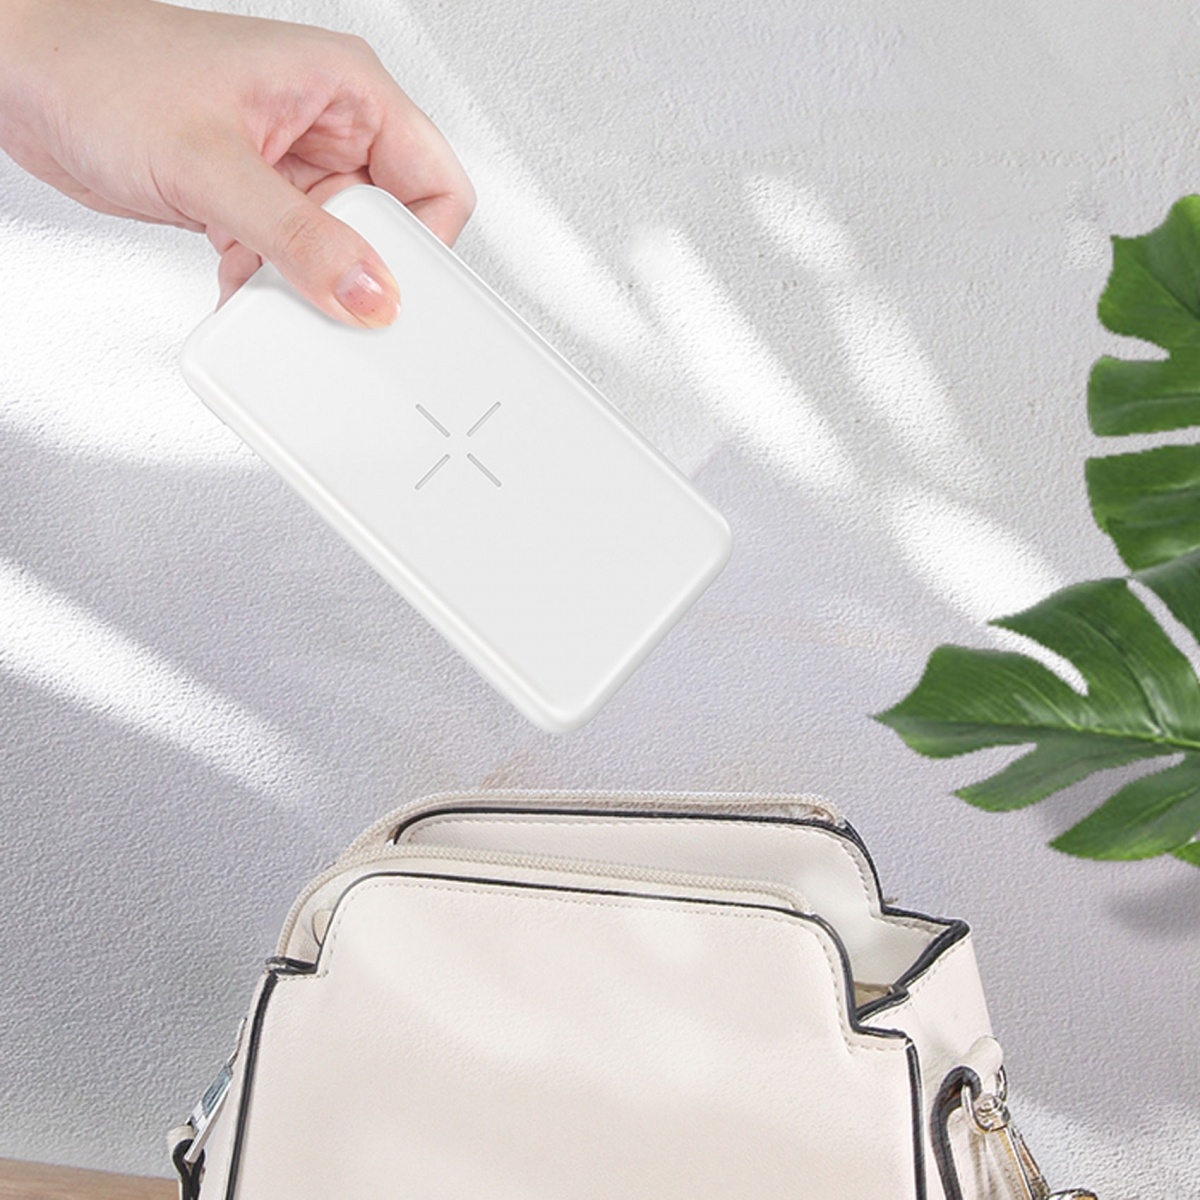 Yoobao W10 Wireless Power Bank - White